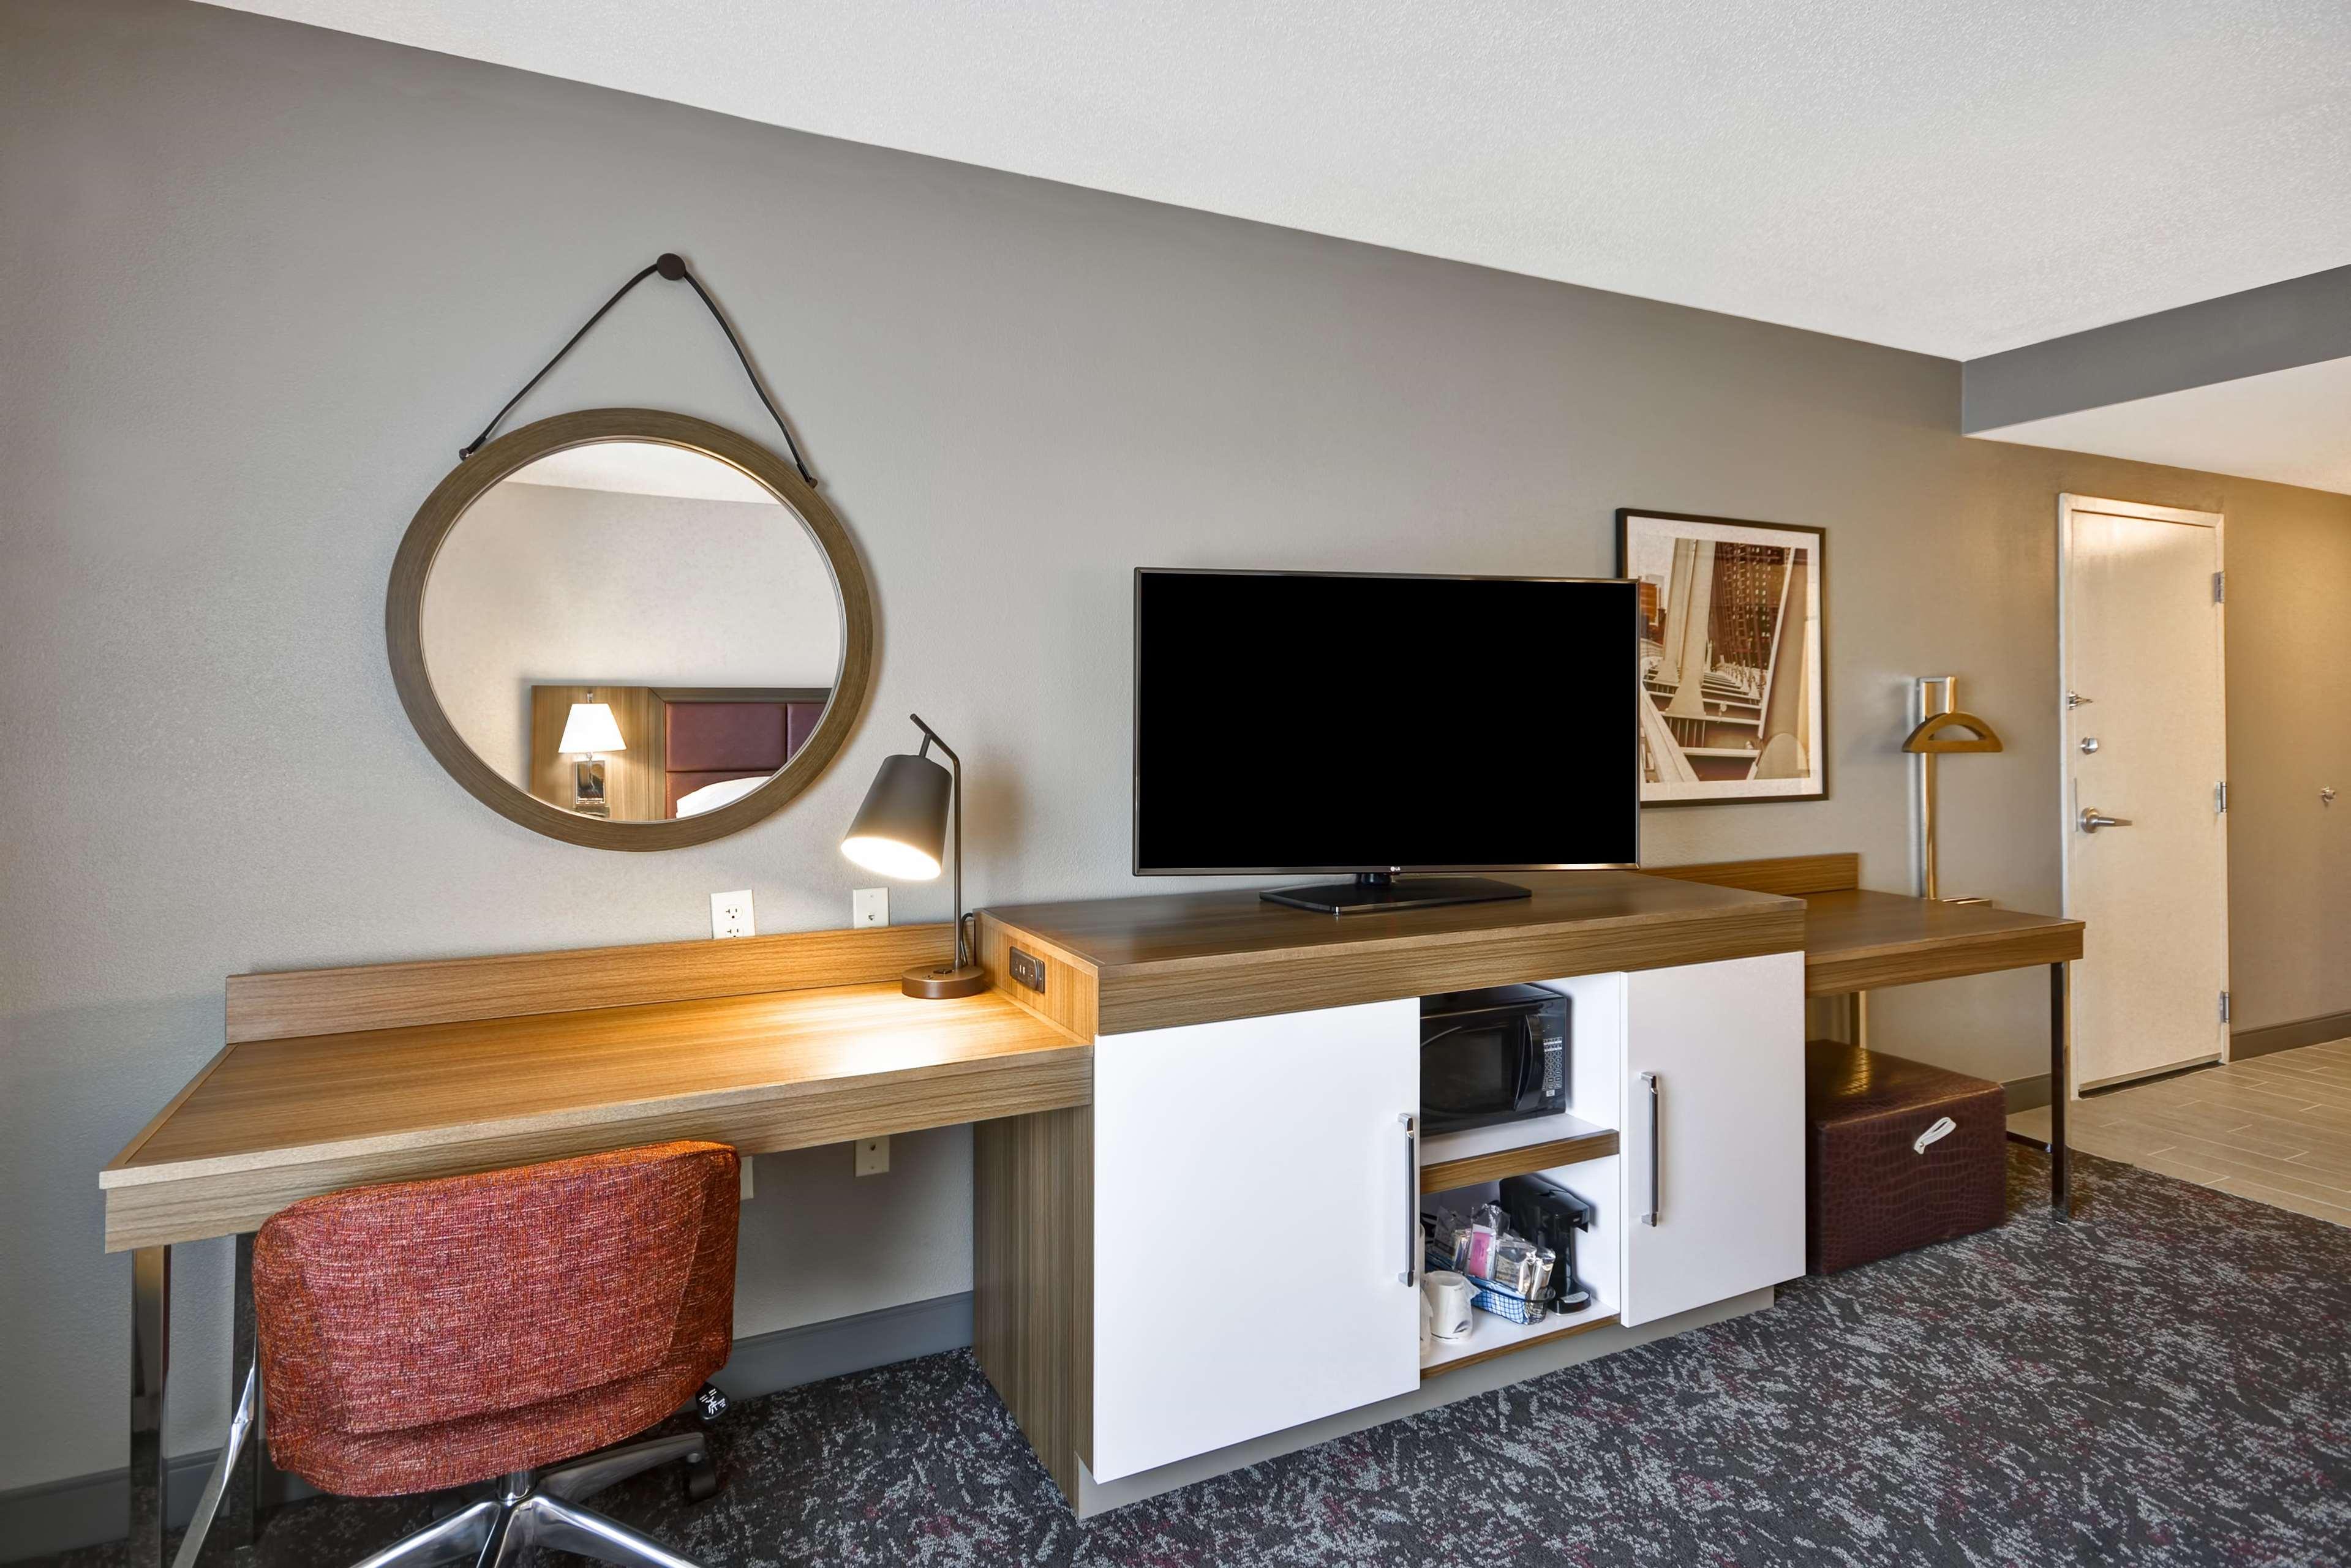 Hampton Inn & Suites Columbus-Easton Area image 47